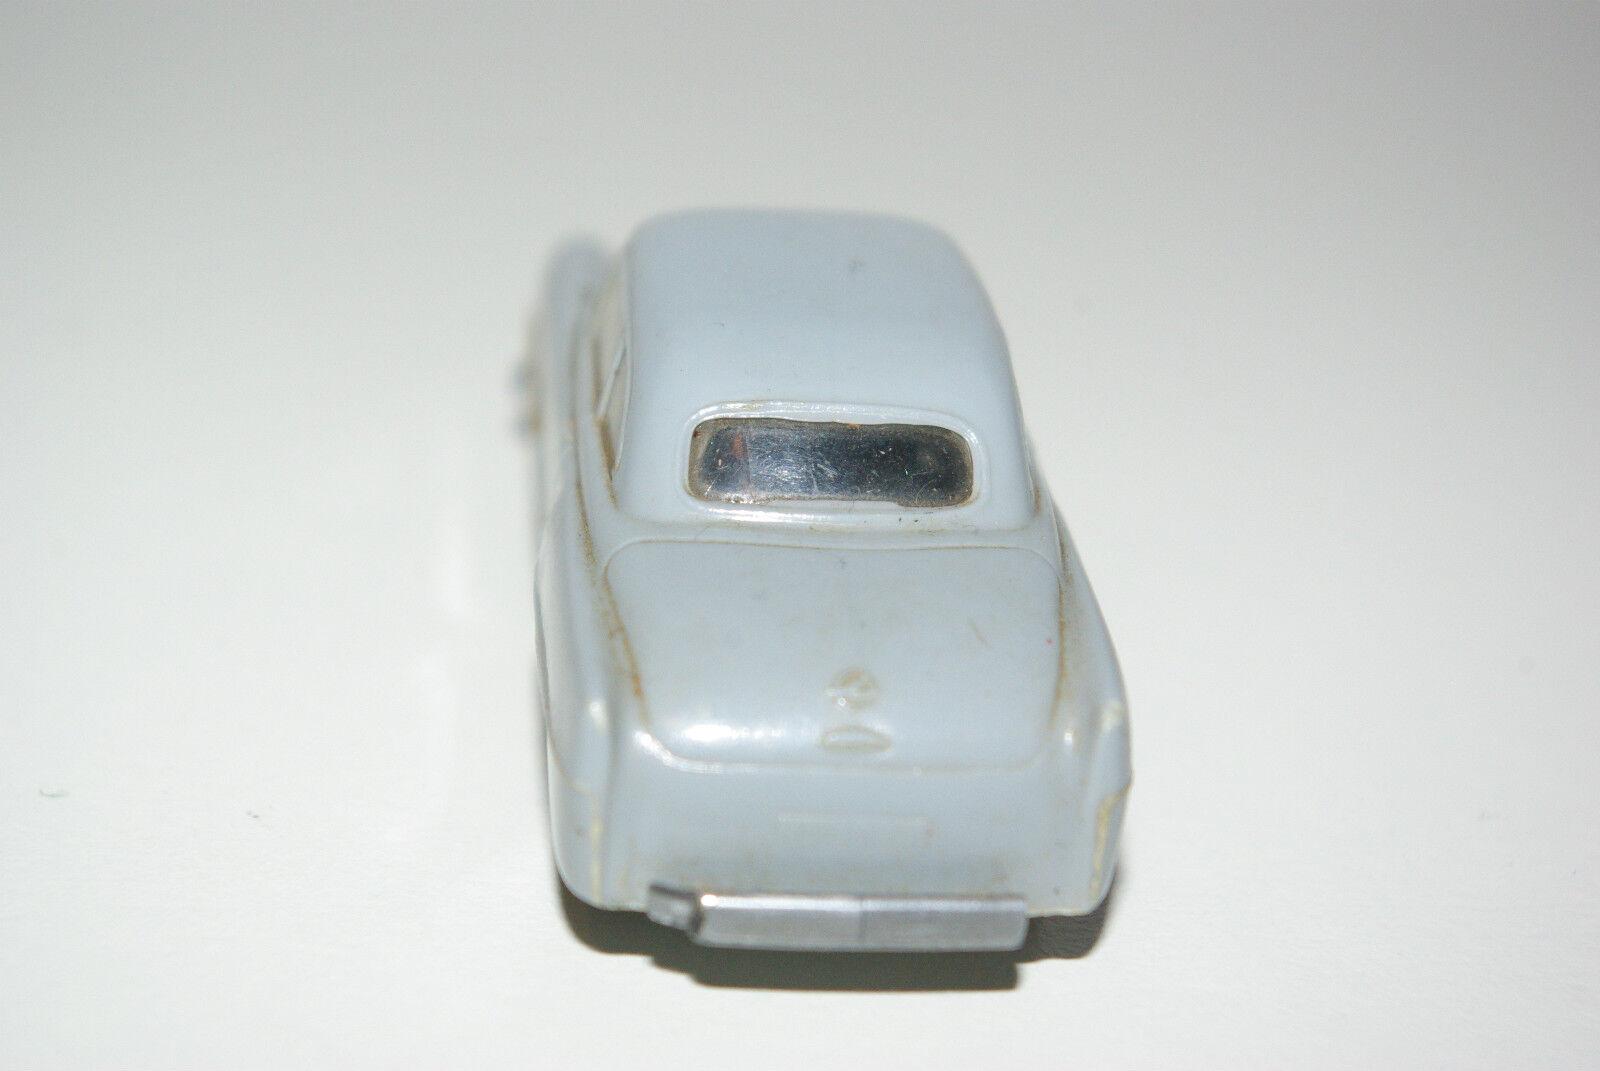 Siku Siku Siku v serie v83 V 83 Opel Rekord gris excellent condition plástico 5d70c3